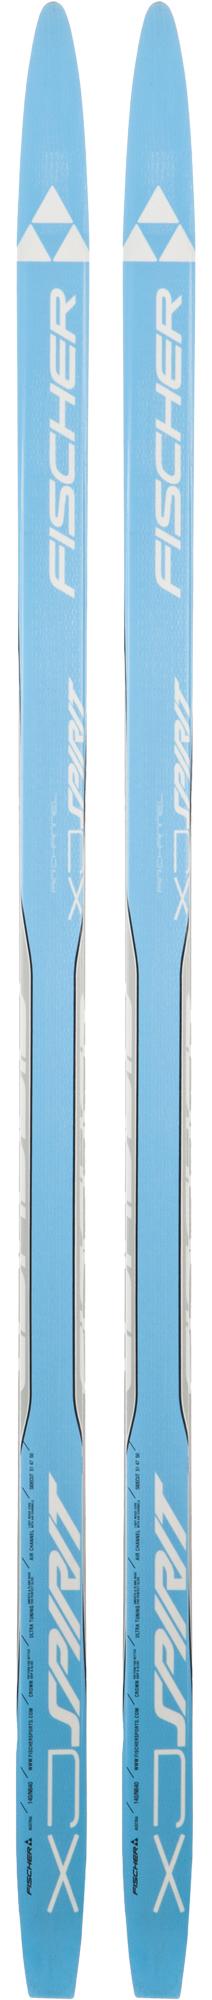 Fischer Лыжи беговые юниорские Fischer Spirit Crown беговые лыжи tisa 90515 top universal 197